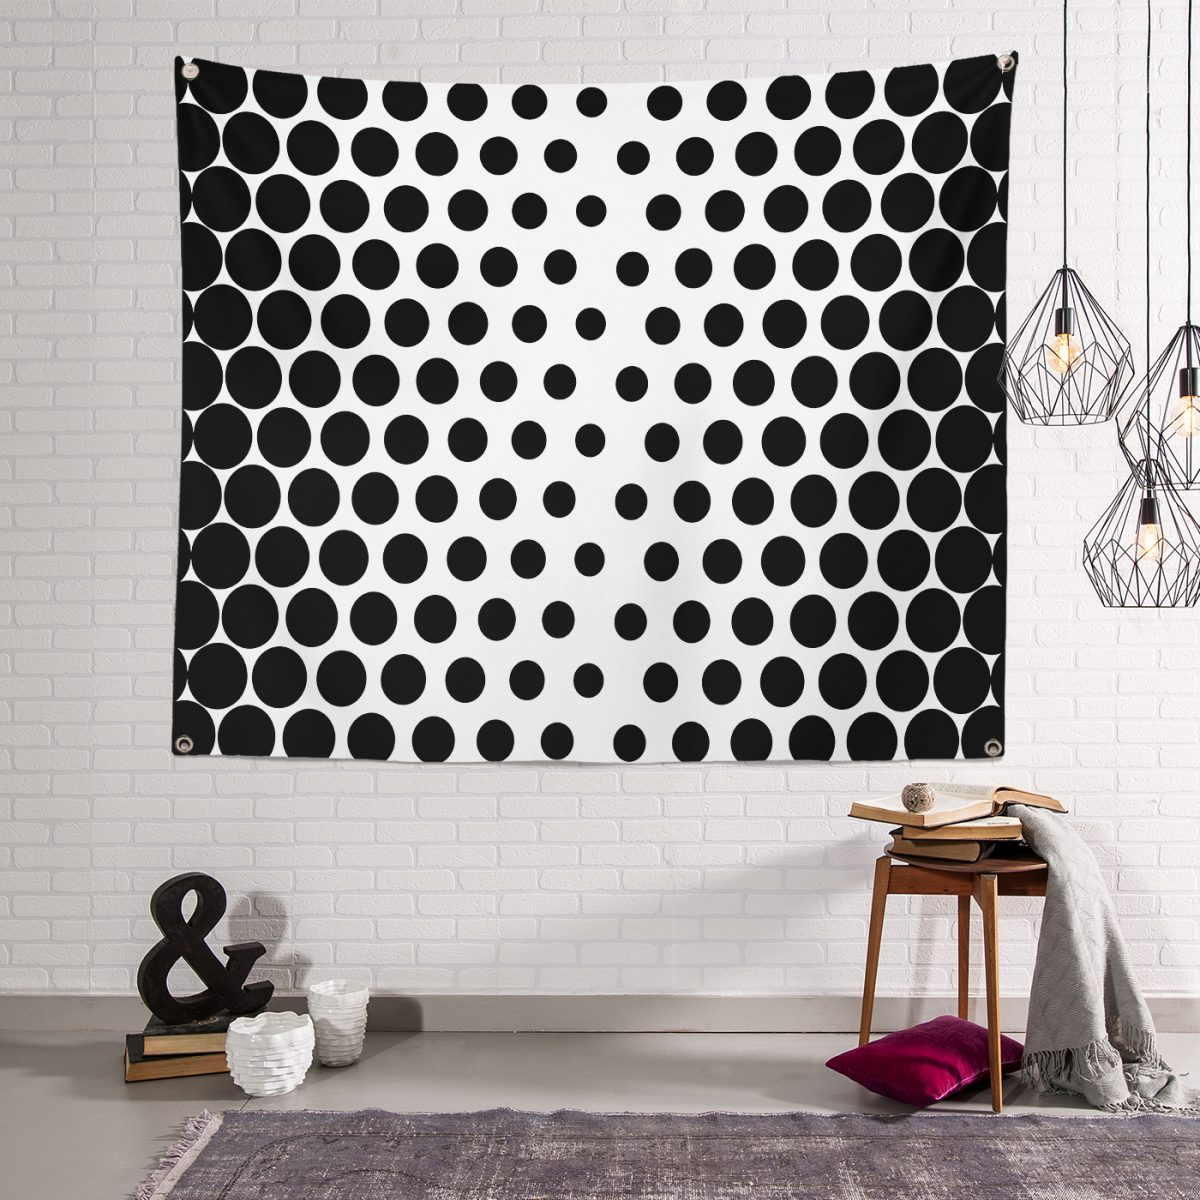 RealHomes Siyah Beyaz İri Puantiyeli Tapestry Duvar Örtüsü Realhomes